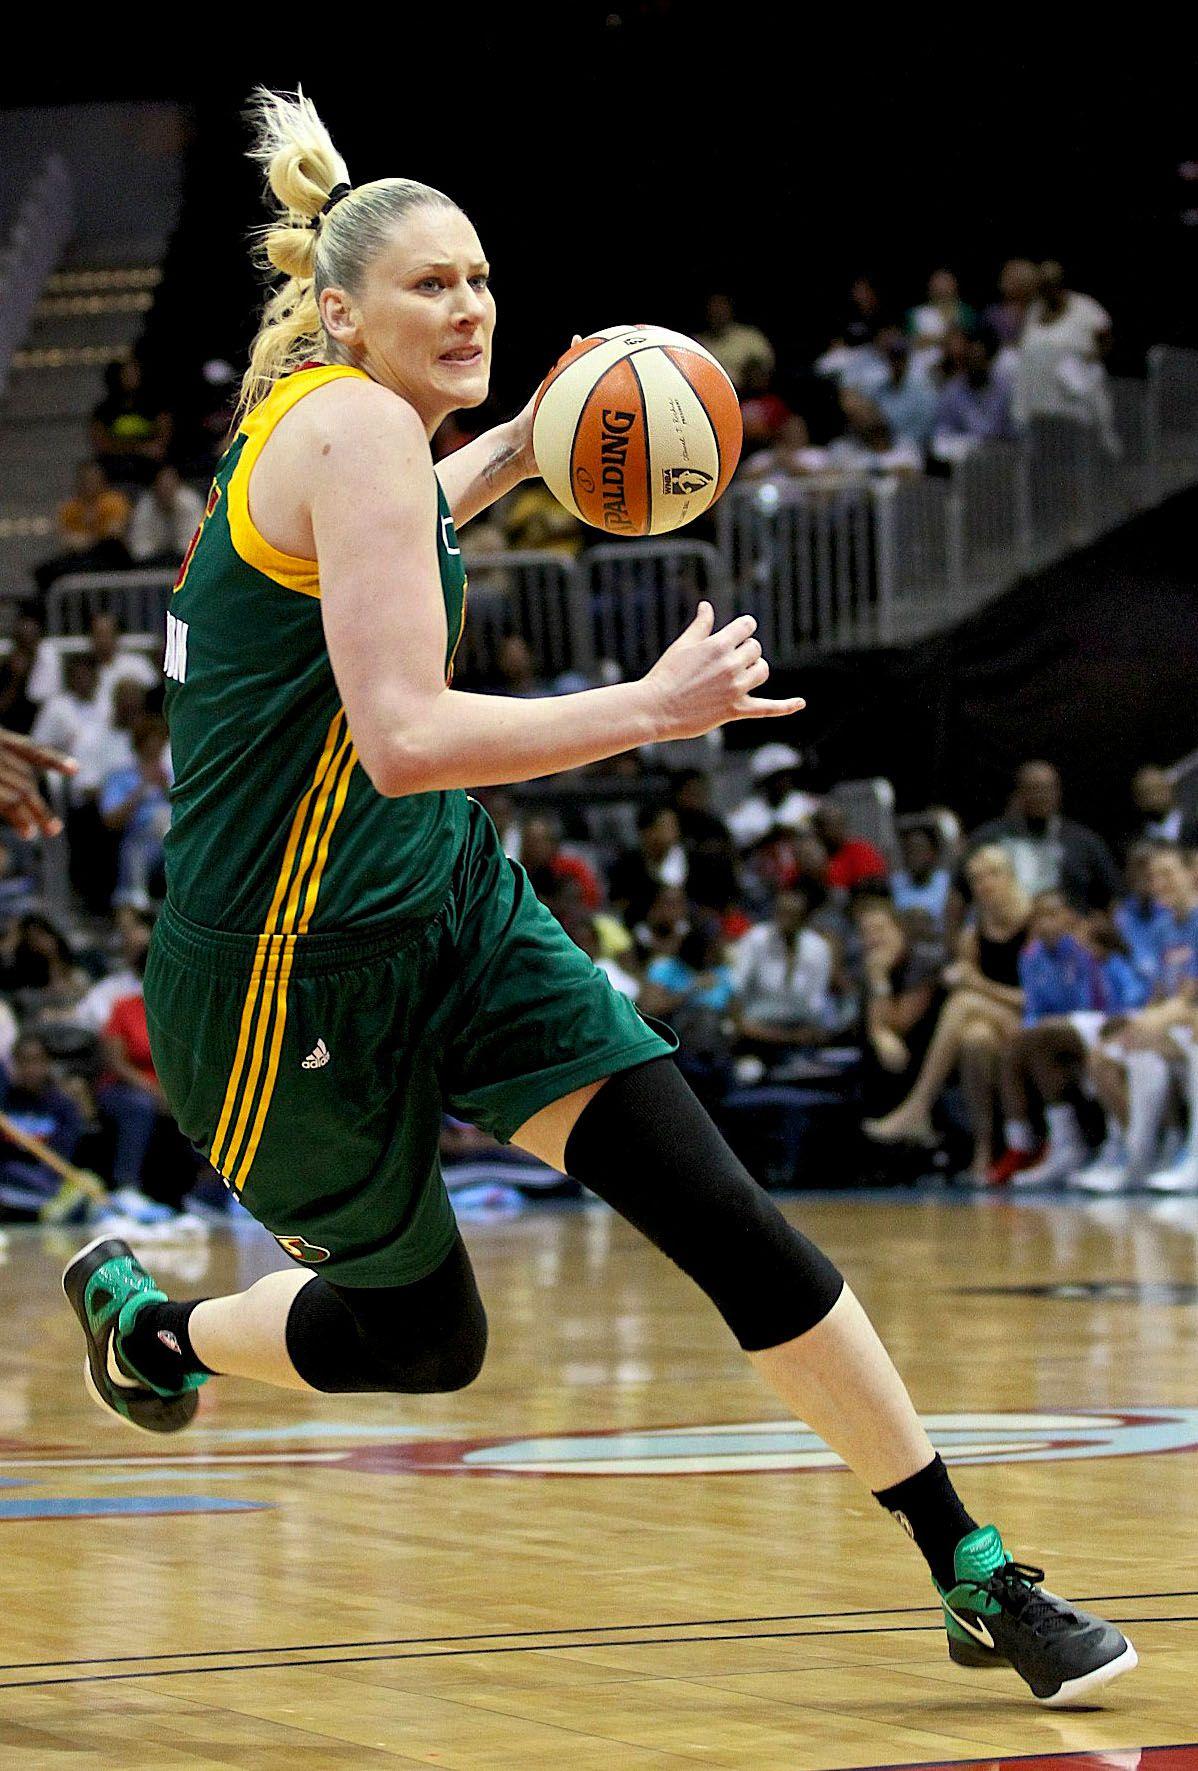 Lauren Jackson Photos Photos - Olympics Day 3 - Basketball